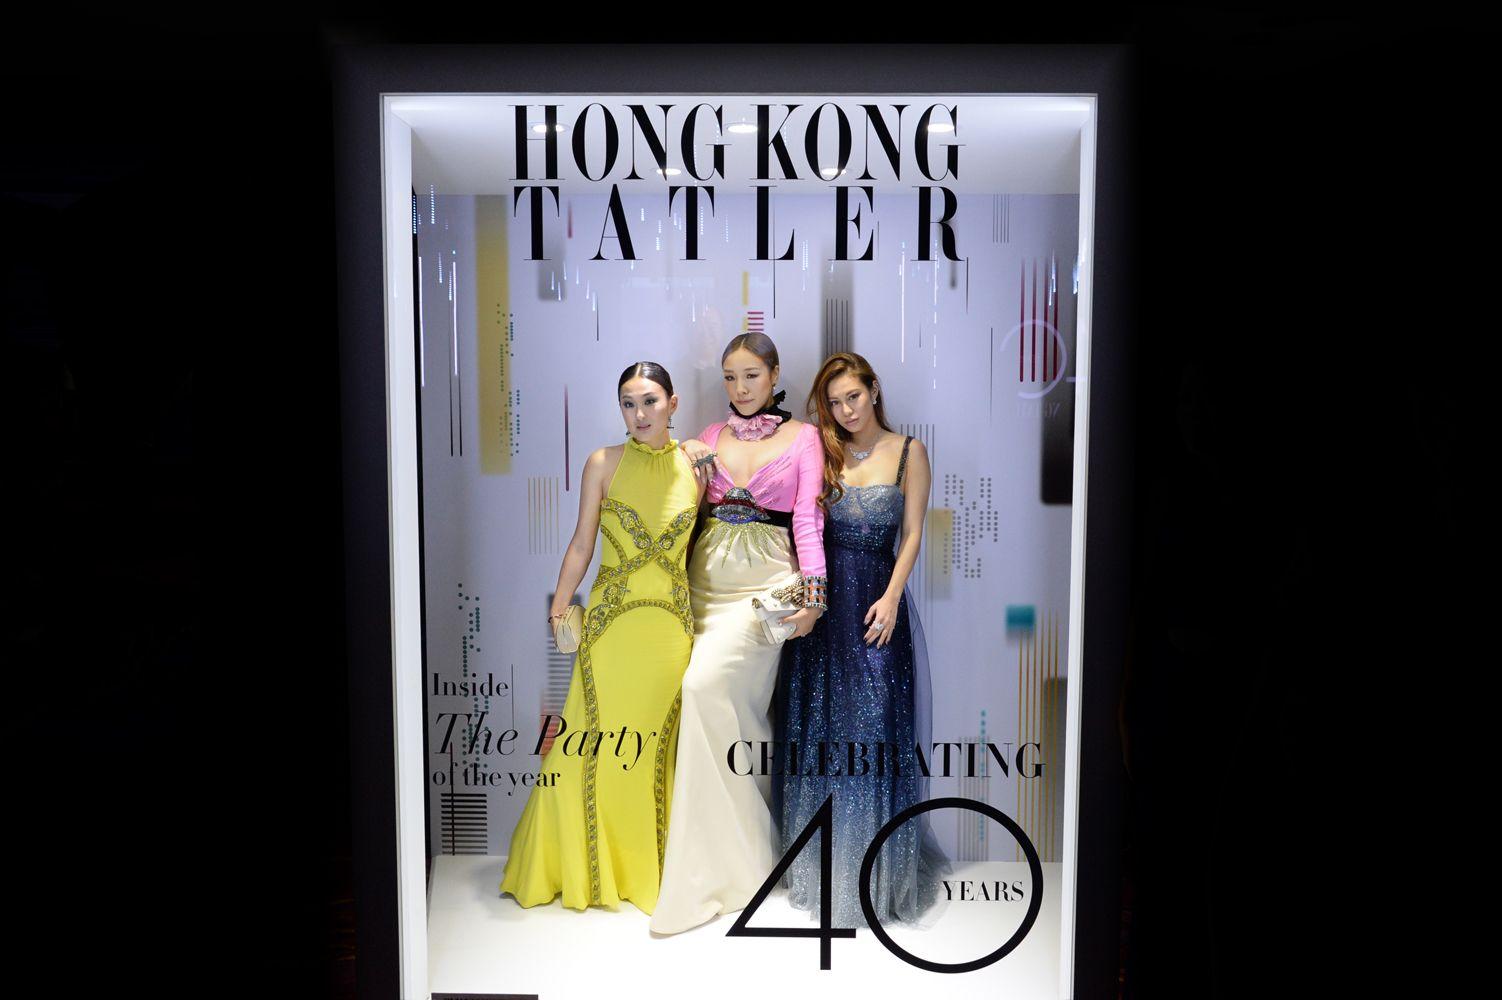 Antonia Li, Feiping Chang, Eleanor Lam